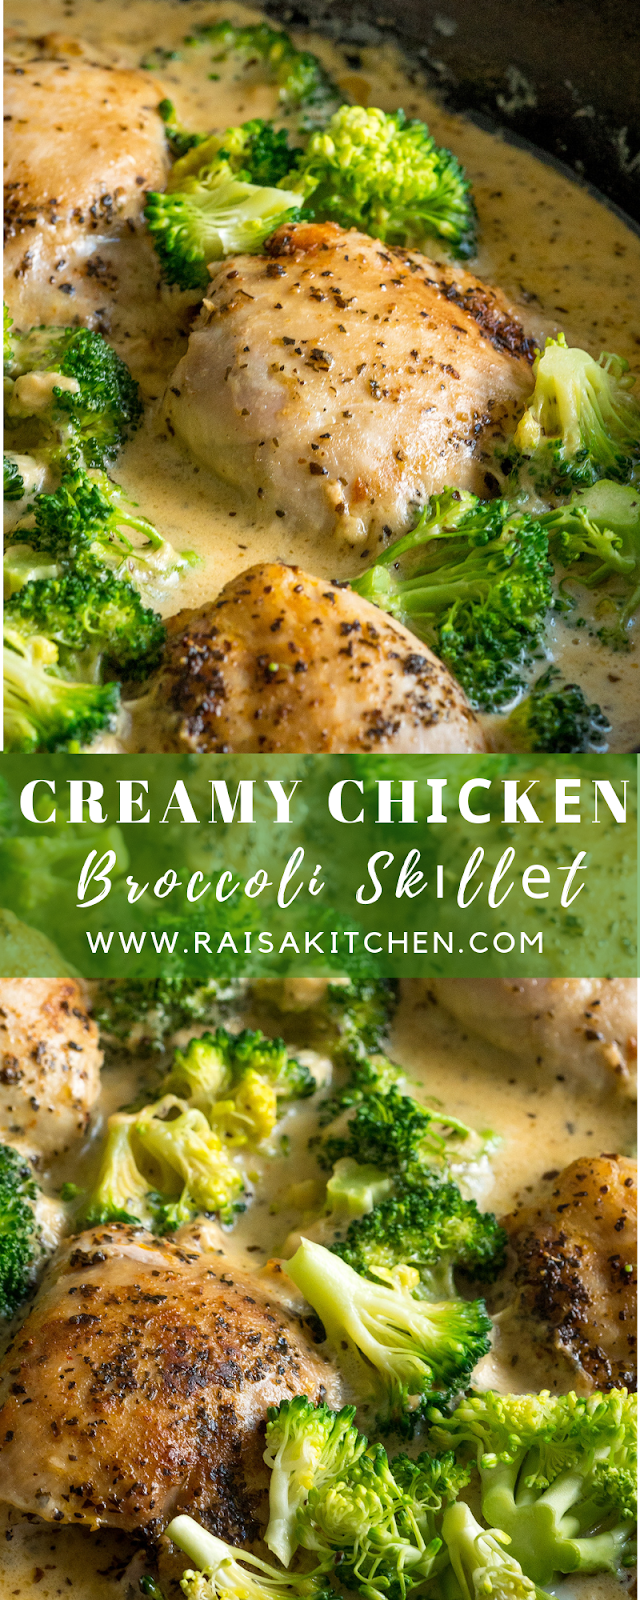 Chісkеn Broccoli Skіllеt